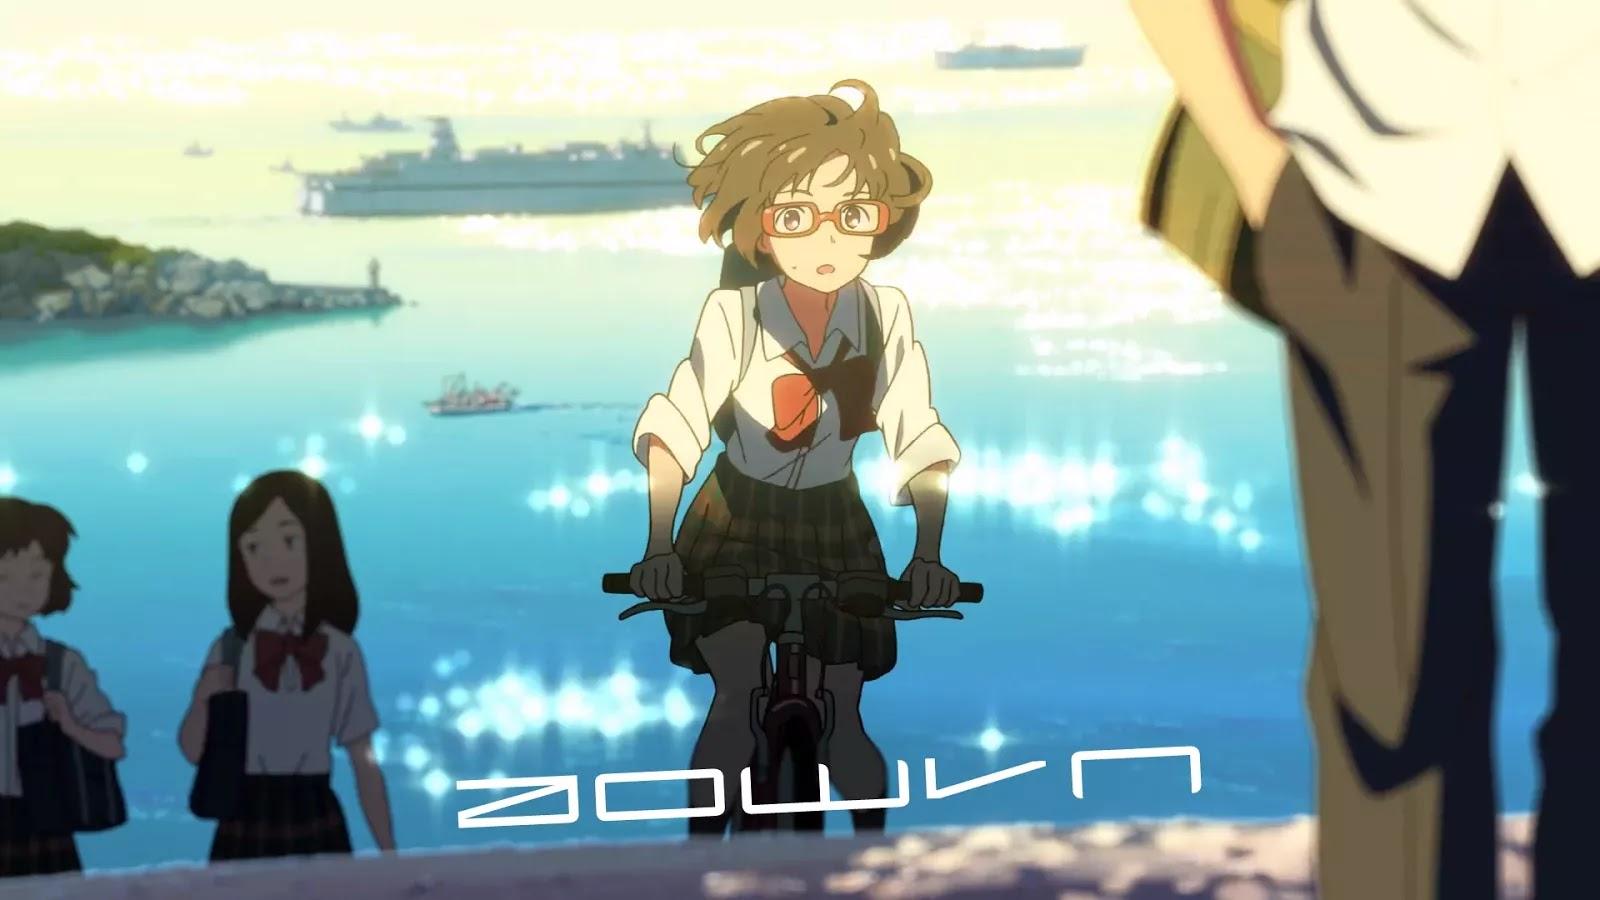 Crossroad aowvn - [ Anime 3gp Mp4 ] Cross Road   Vietsub - 2 Phút Tuyệt Đẹp